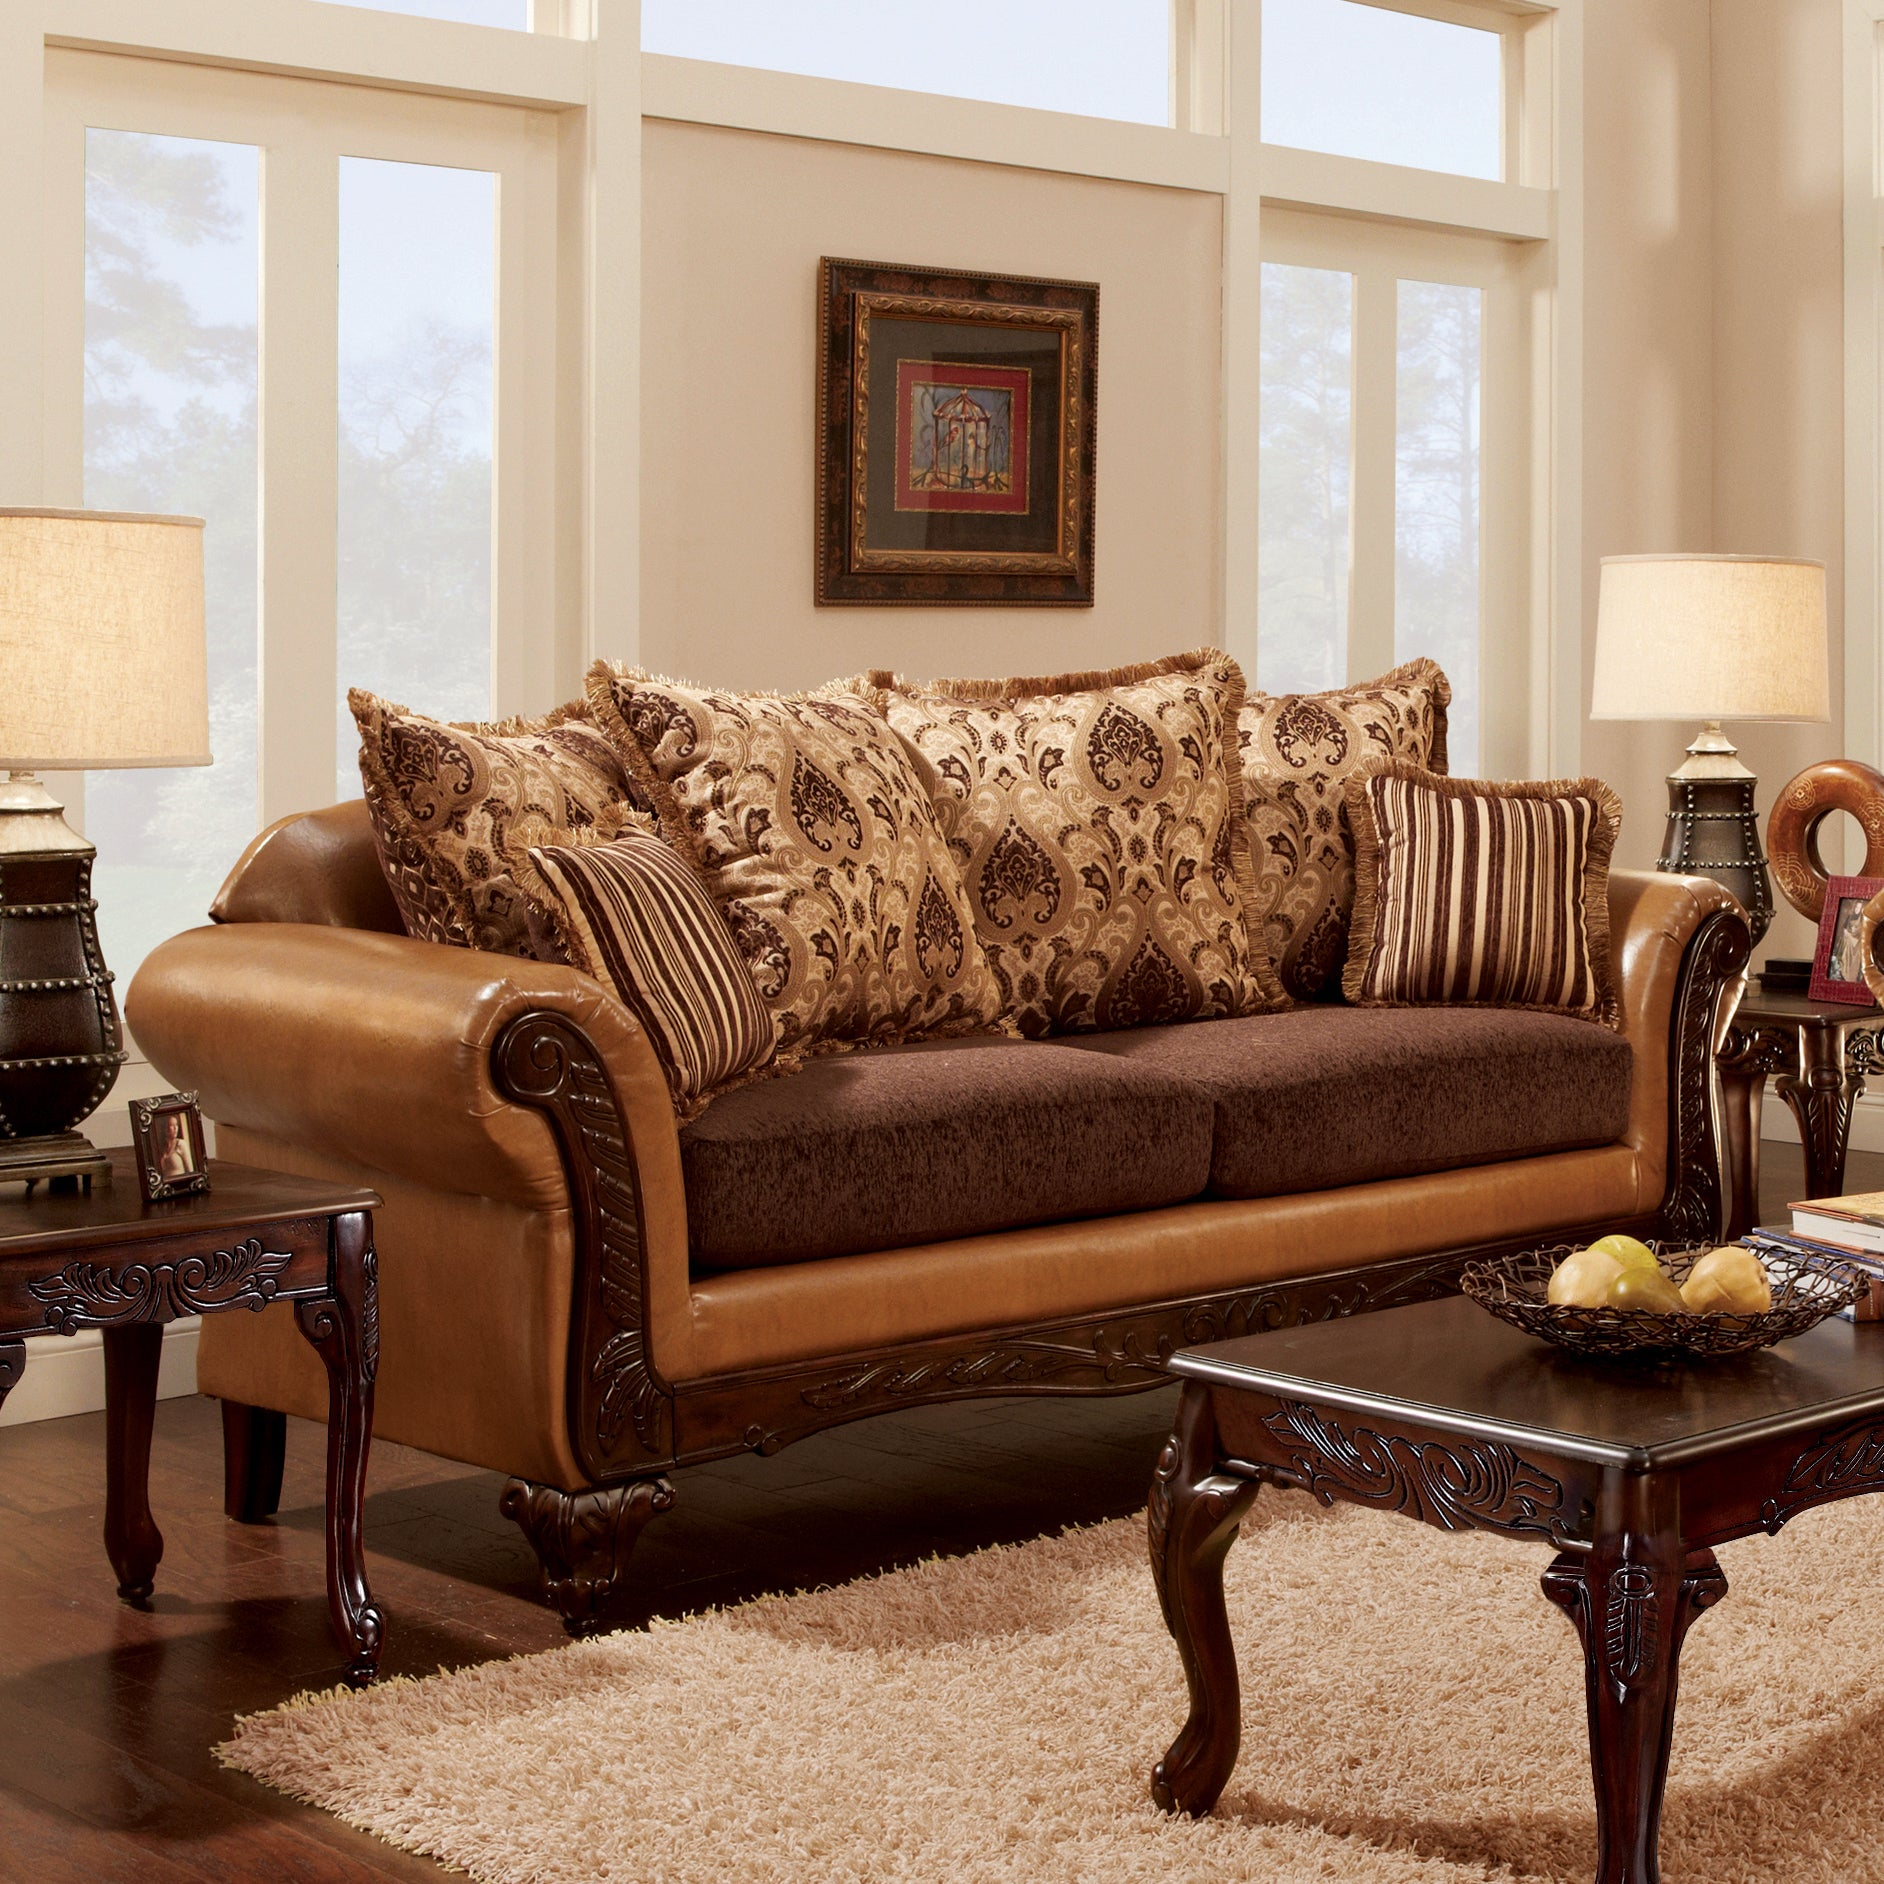 Furniture of America Lenea Traditional Chenille Fabric an...